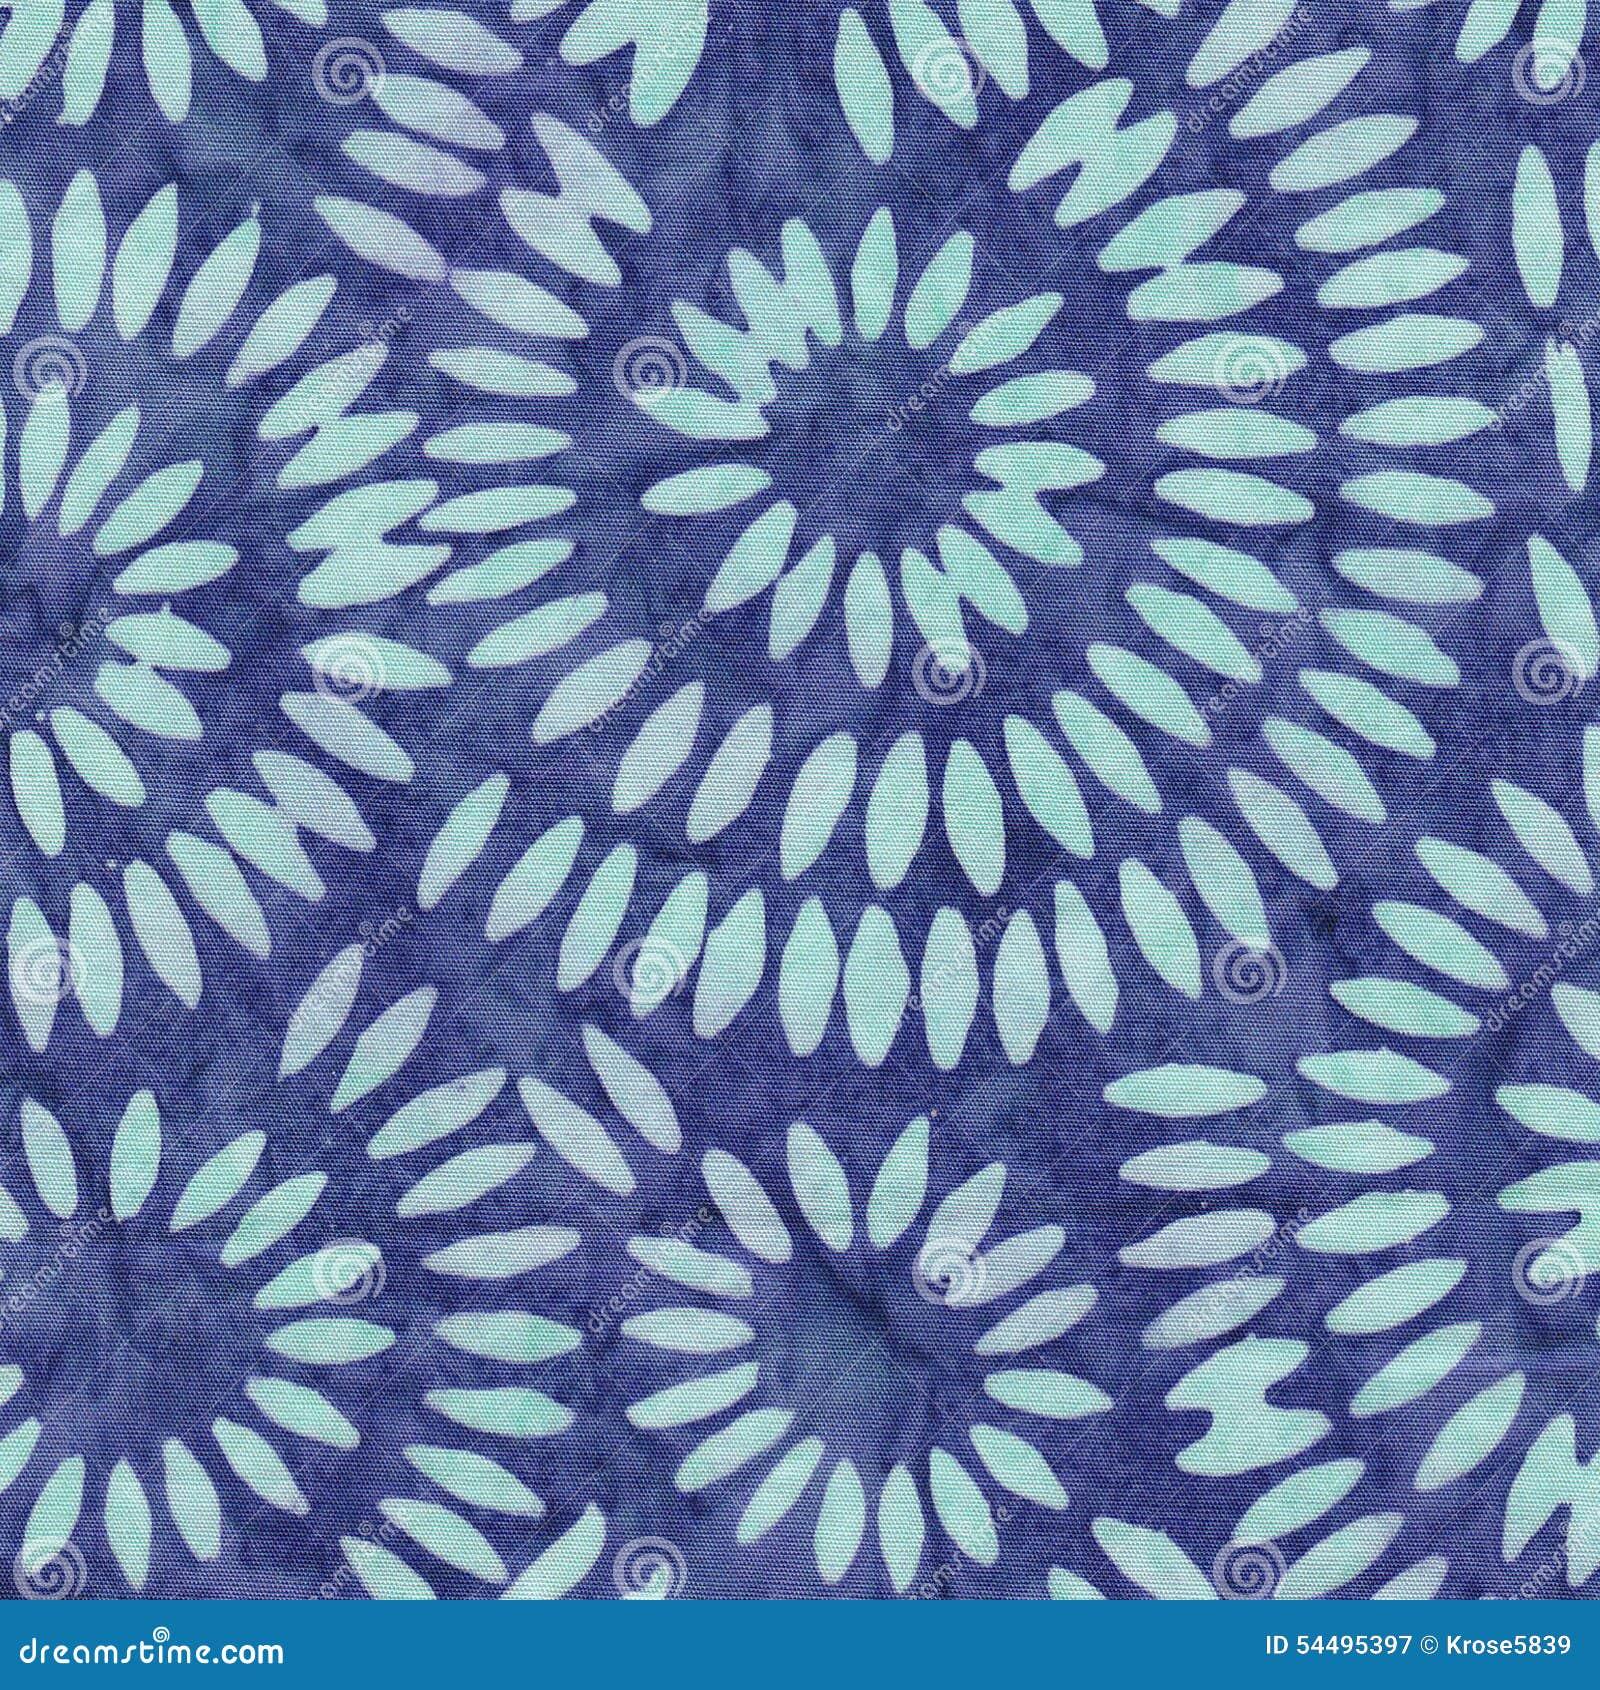 download blaues batik muster stockbild bild von beschaffenheit 54495397 - Batiken Muster